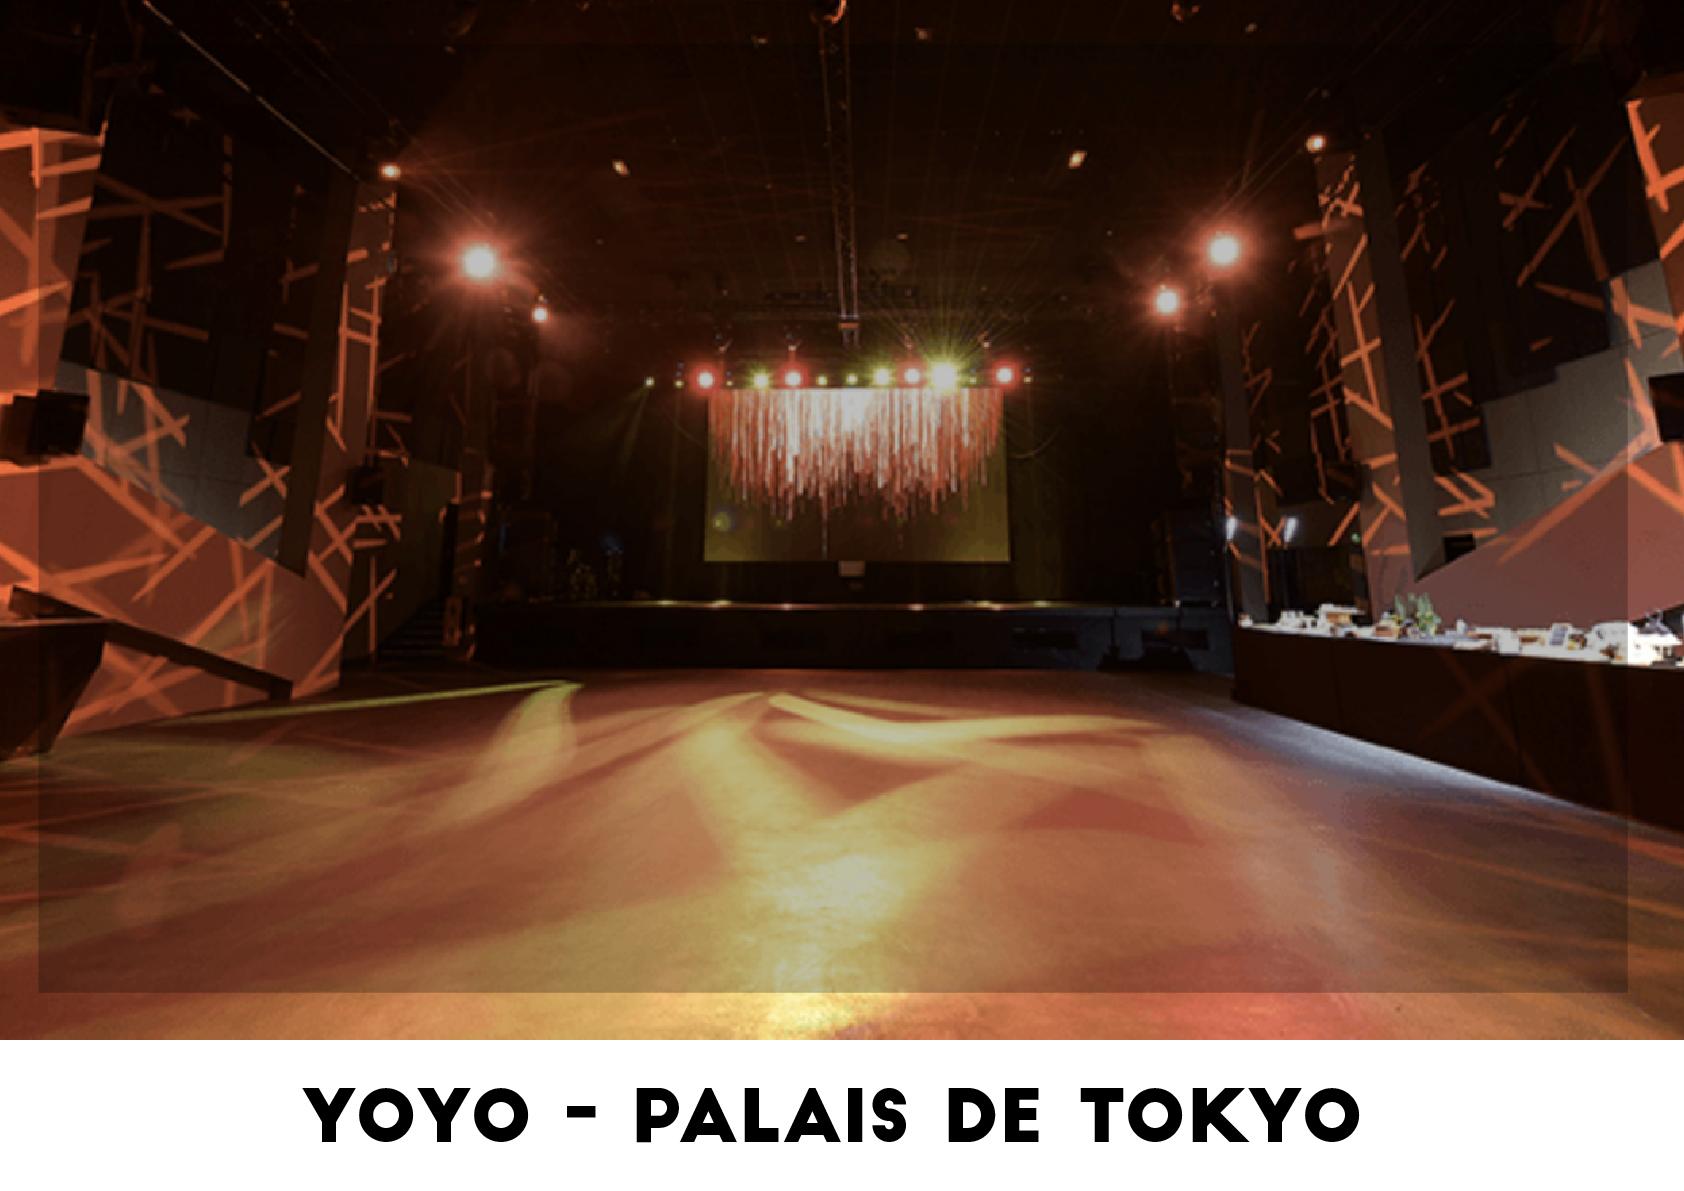 Lieu événementiel - Yoyo - Palais de Tokyo